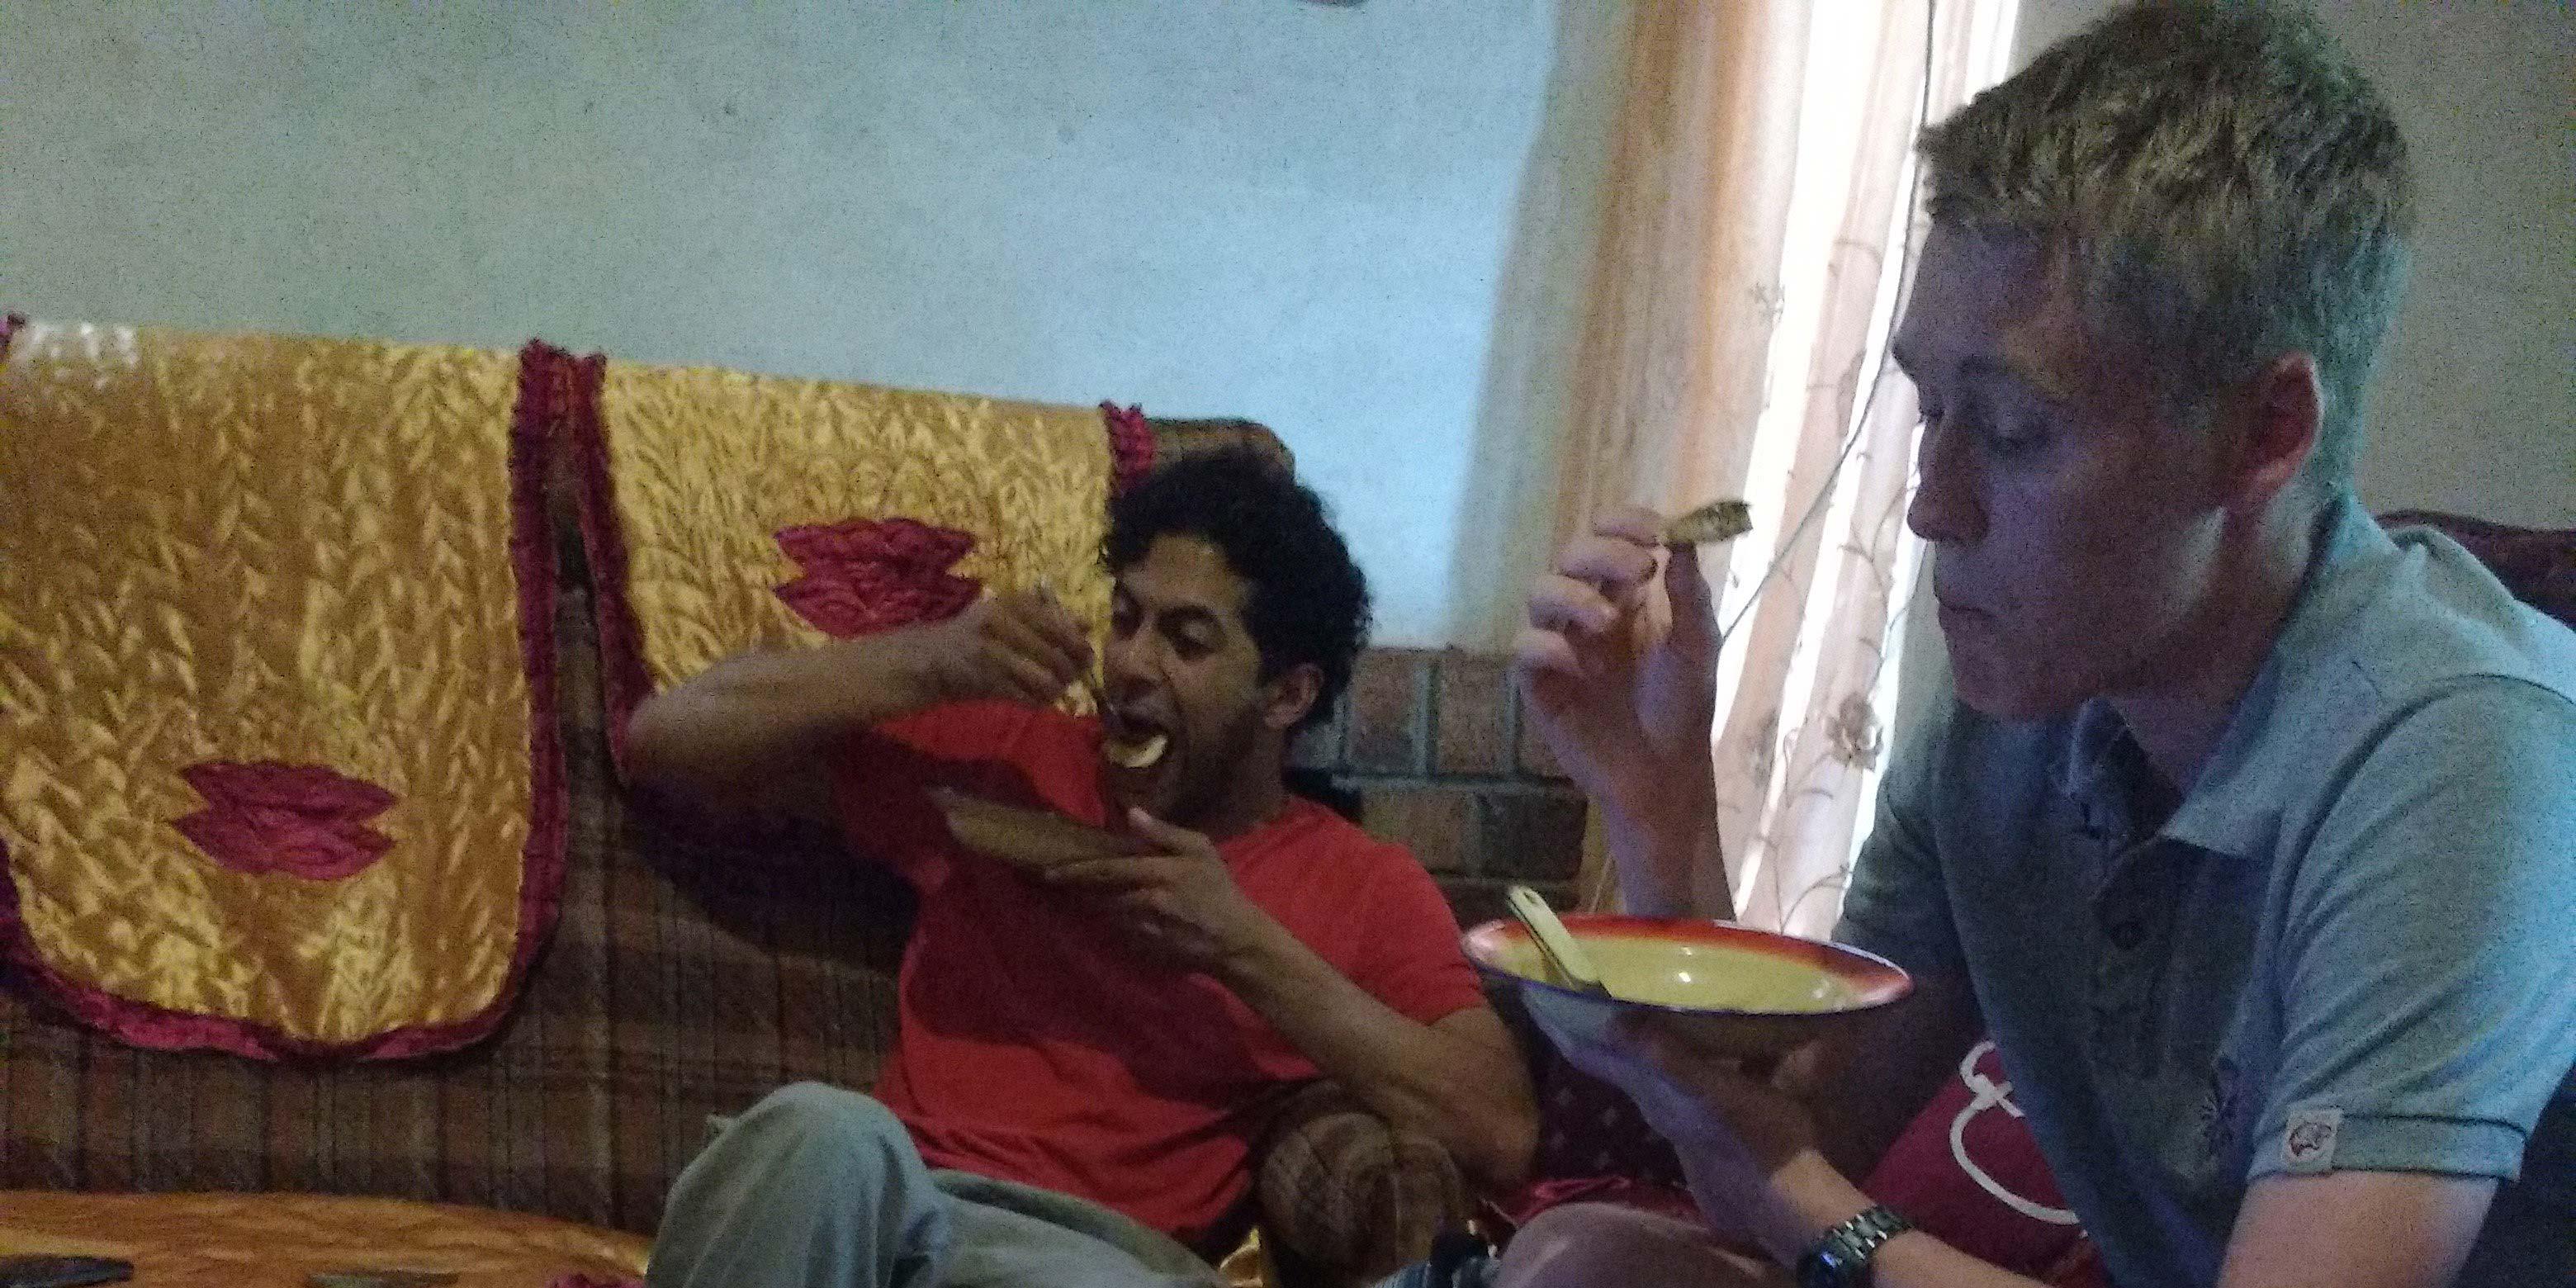 Jack and Ahmad scoffing pancakes